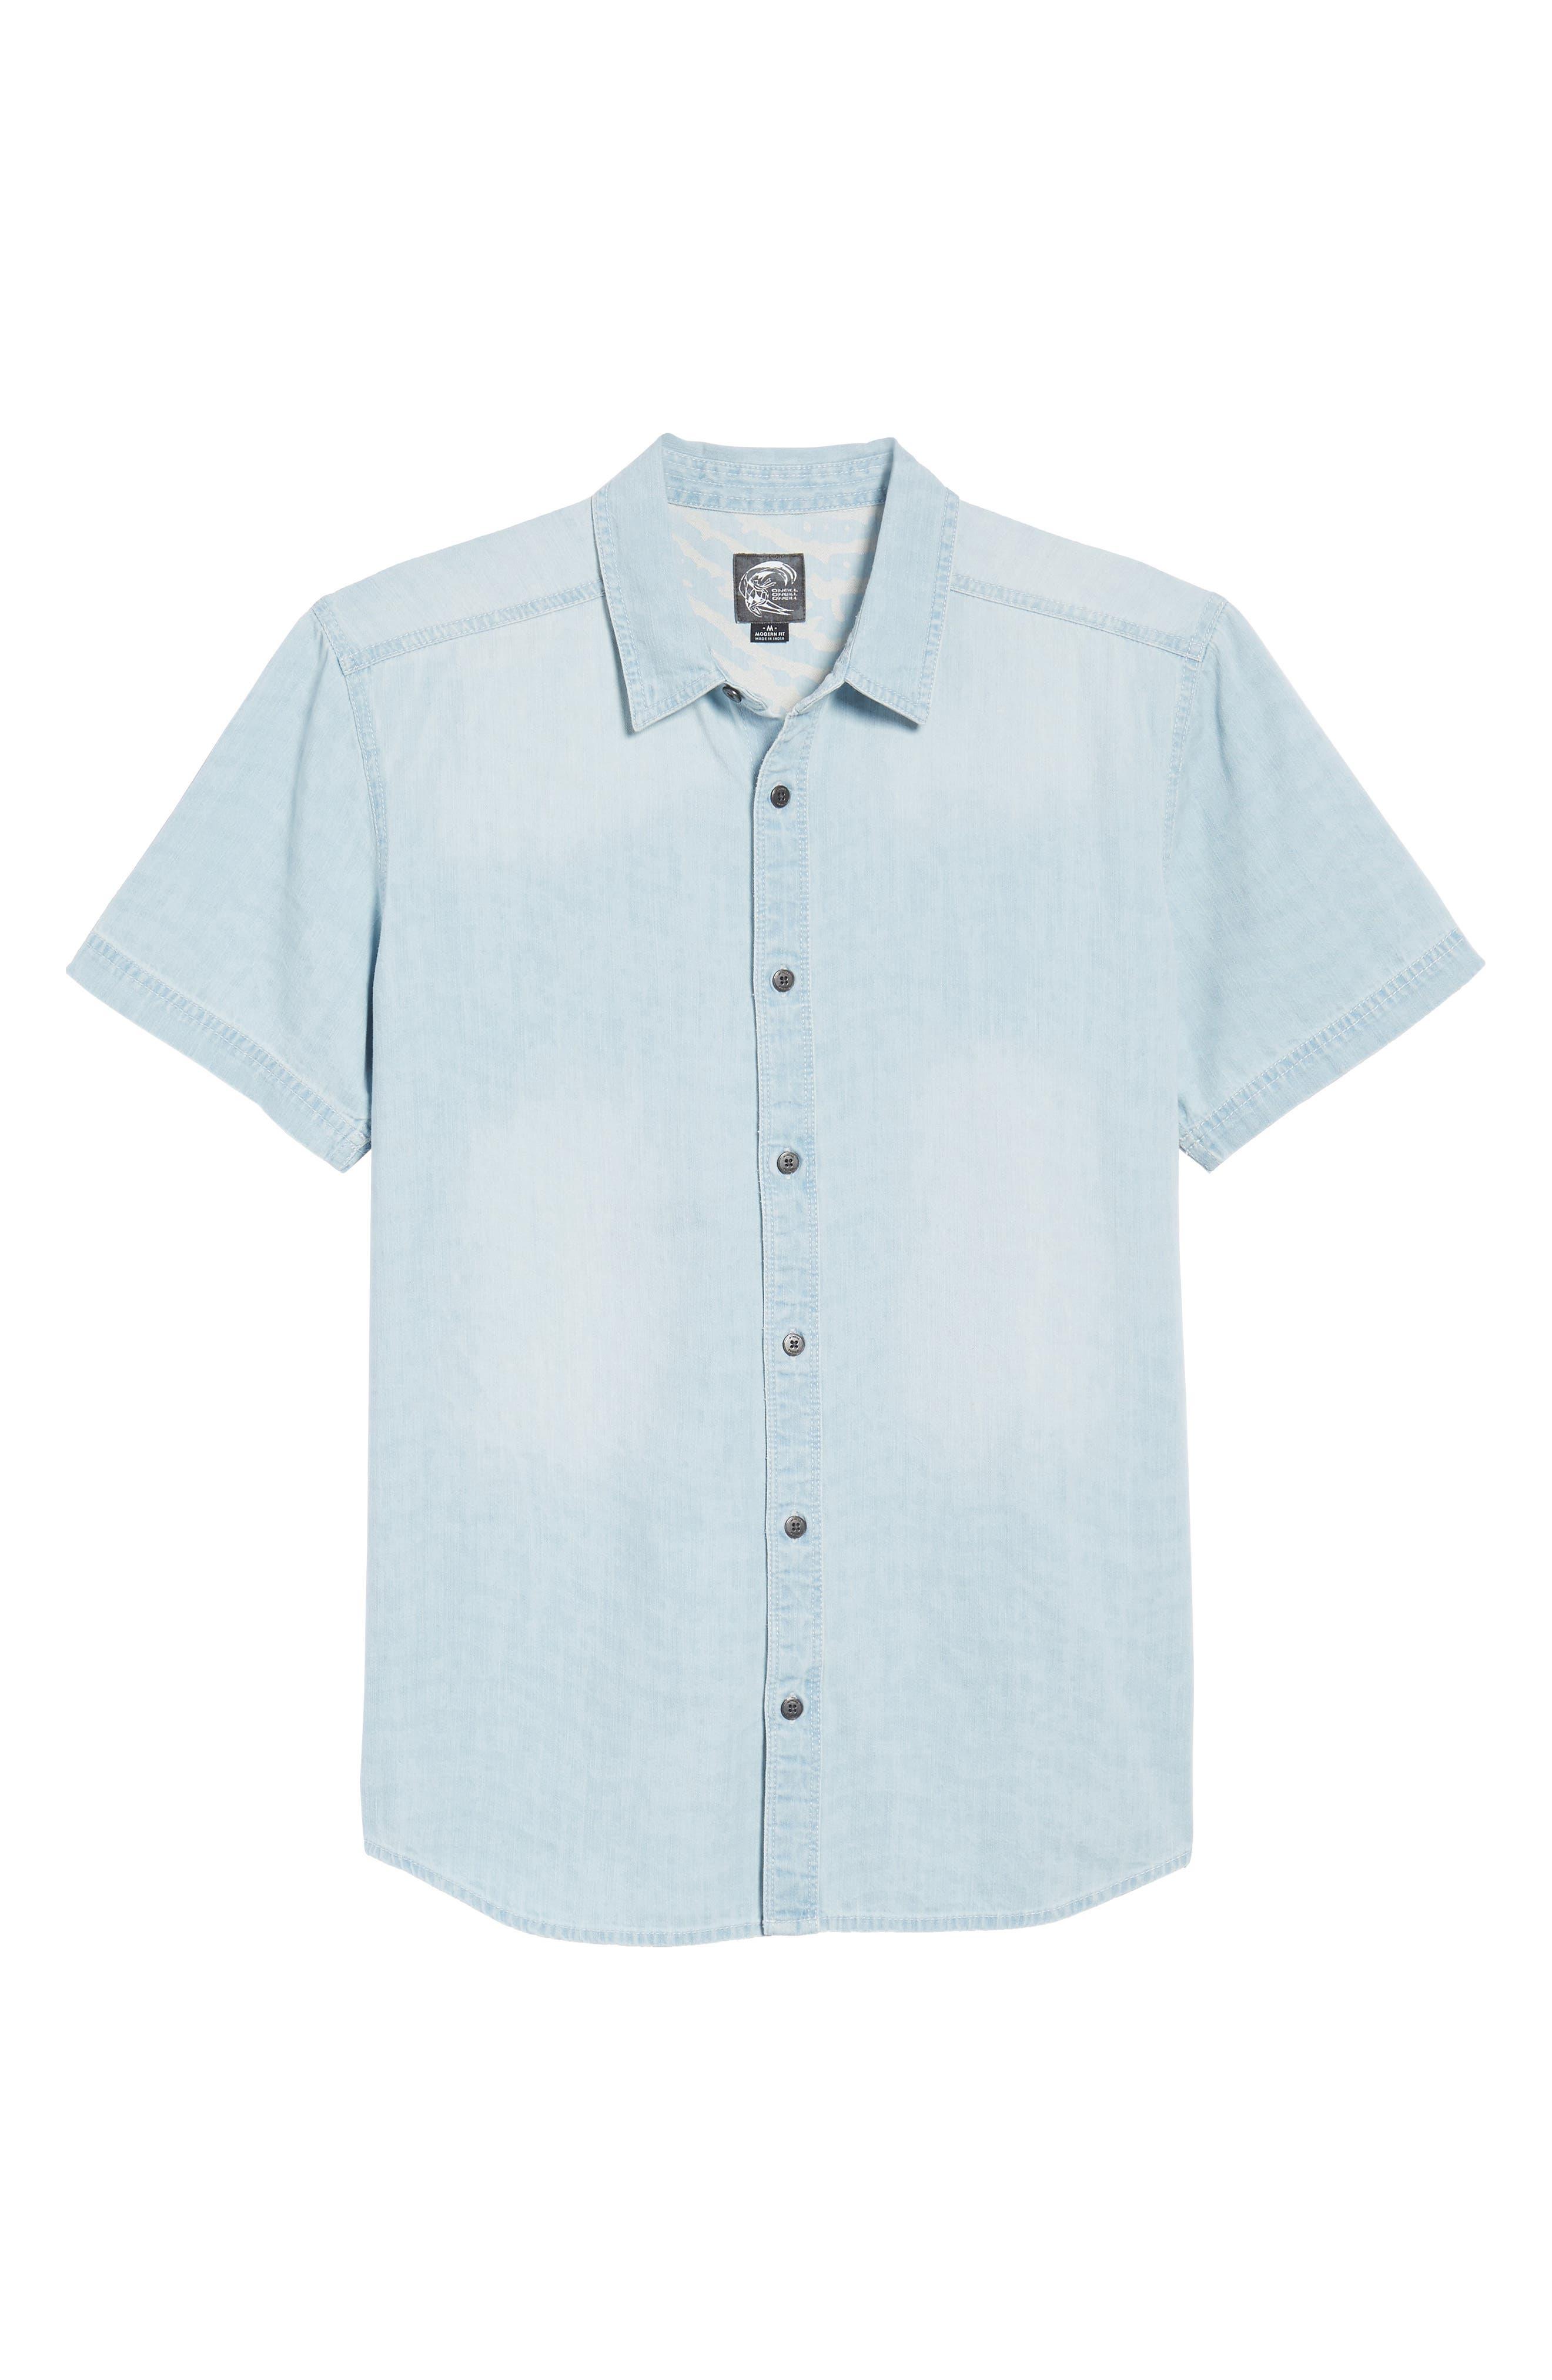 Sabotage Woven Shirt,                             Alternate thumbnail 6, color,                             020